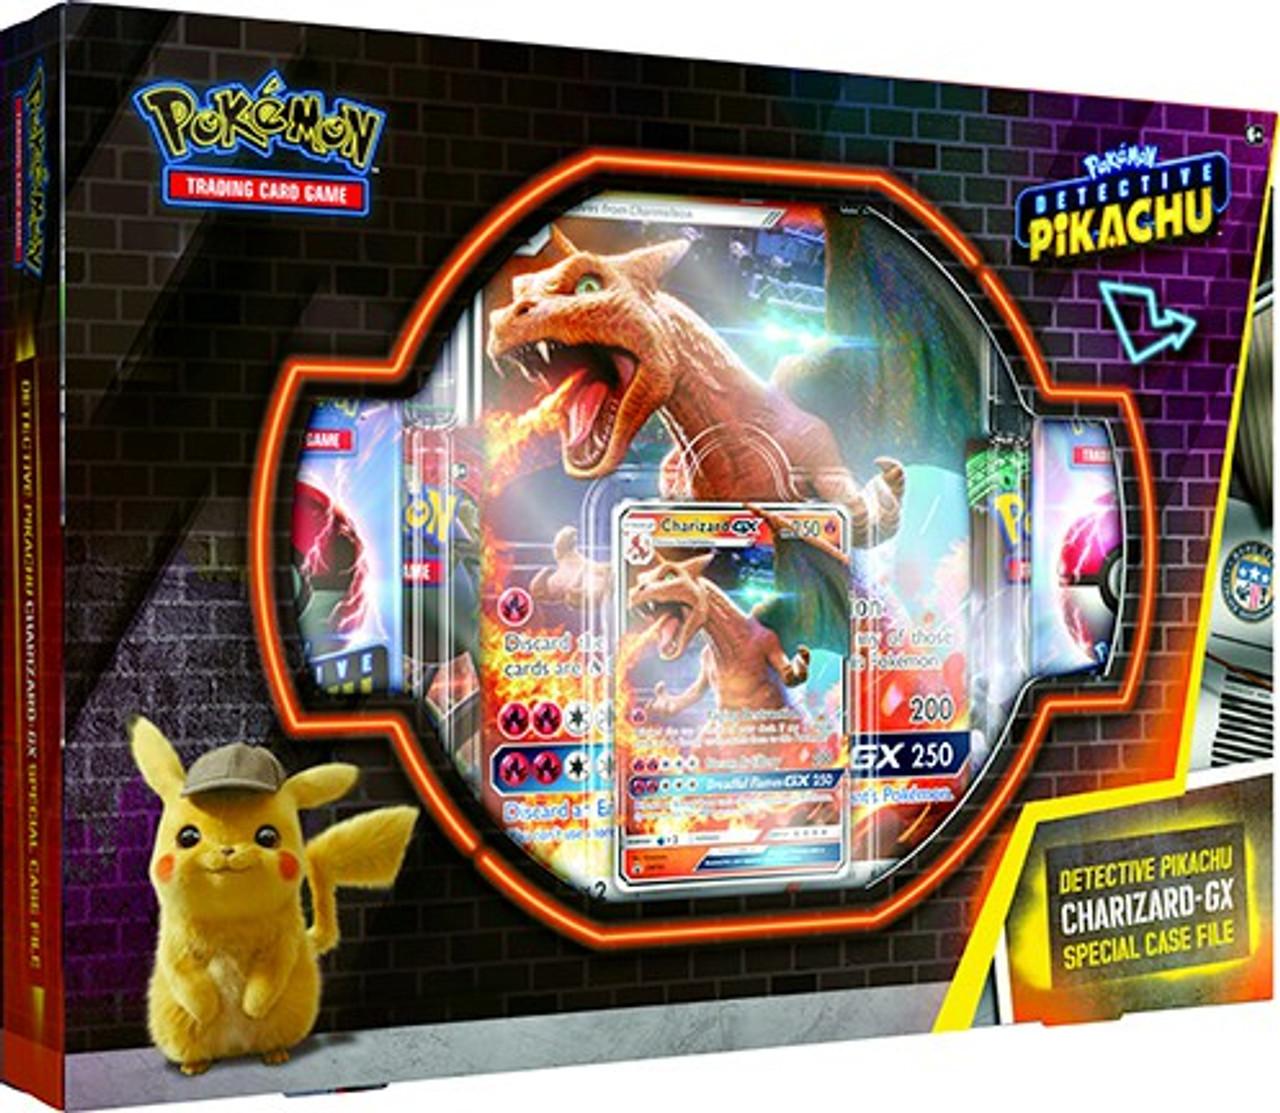 Pokemon Trading Card Game Detective Pikachu Charizard Gx Special Case File Pokemon Usa Toywiz